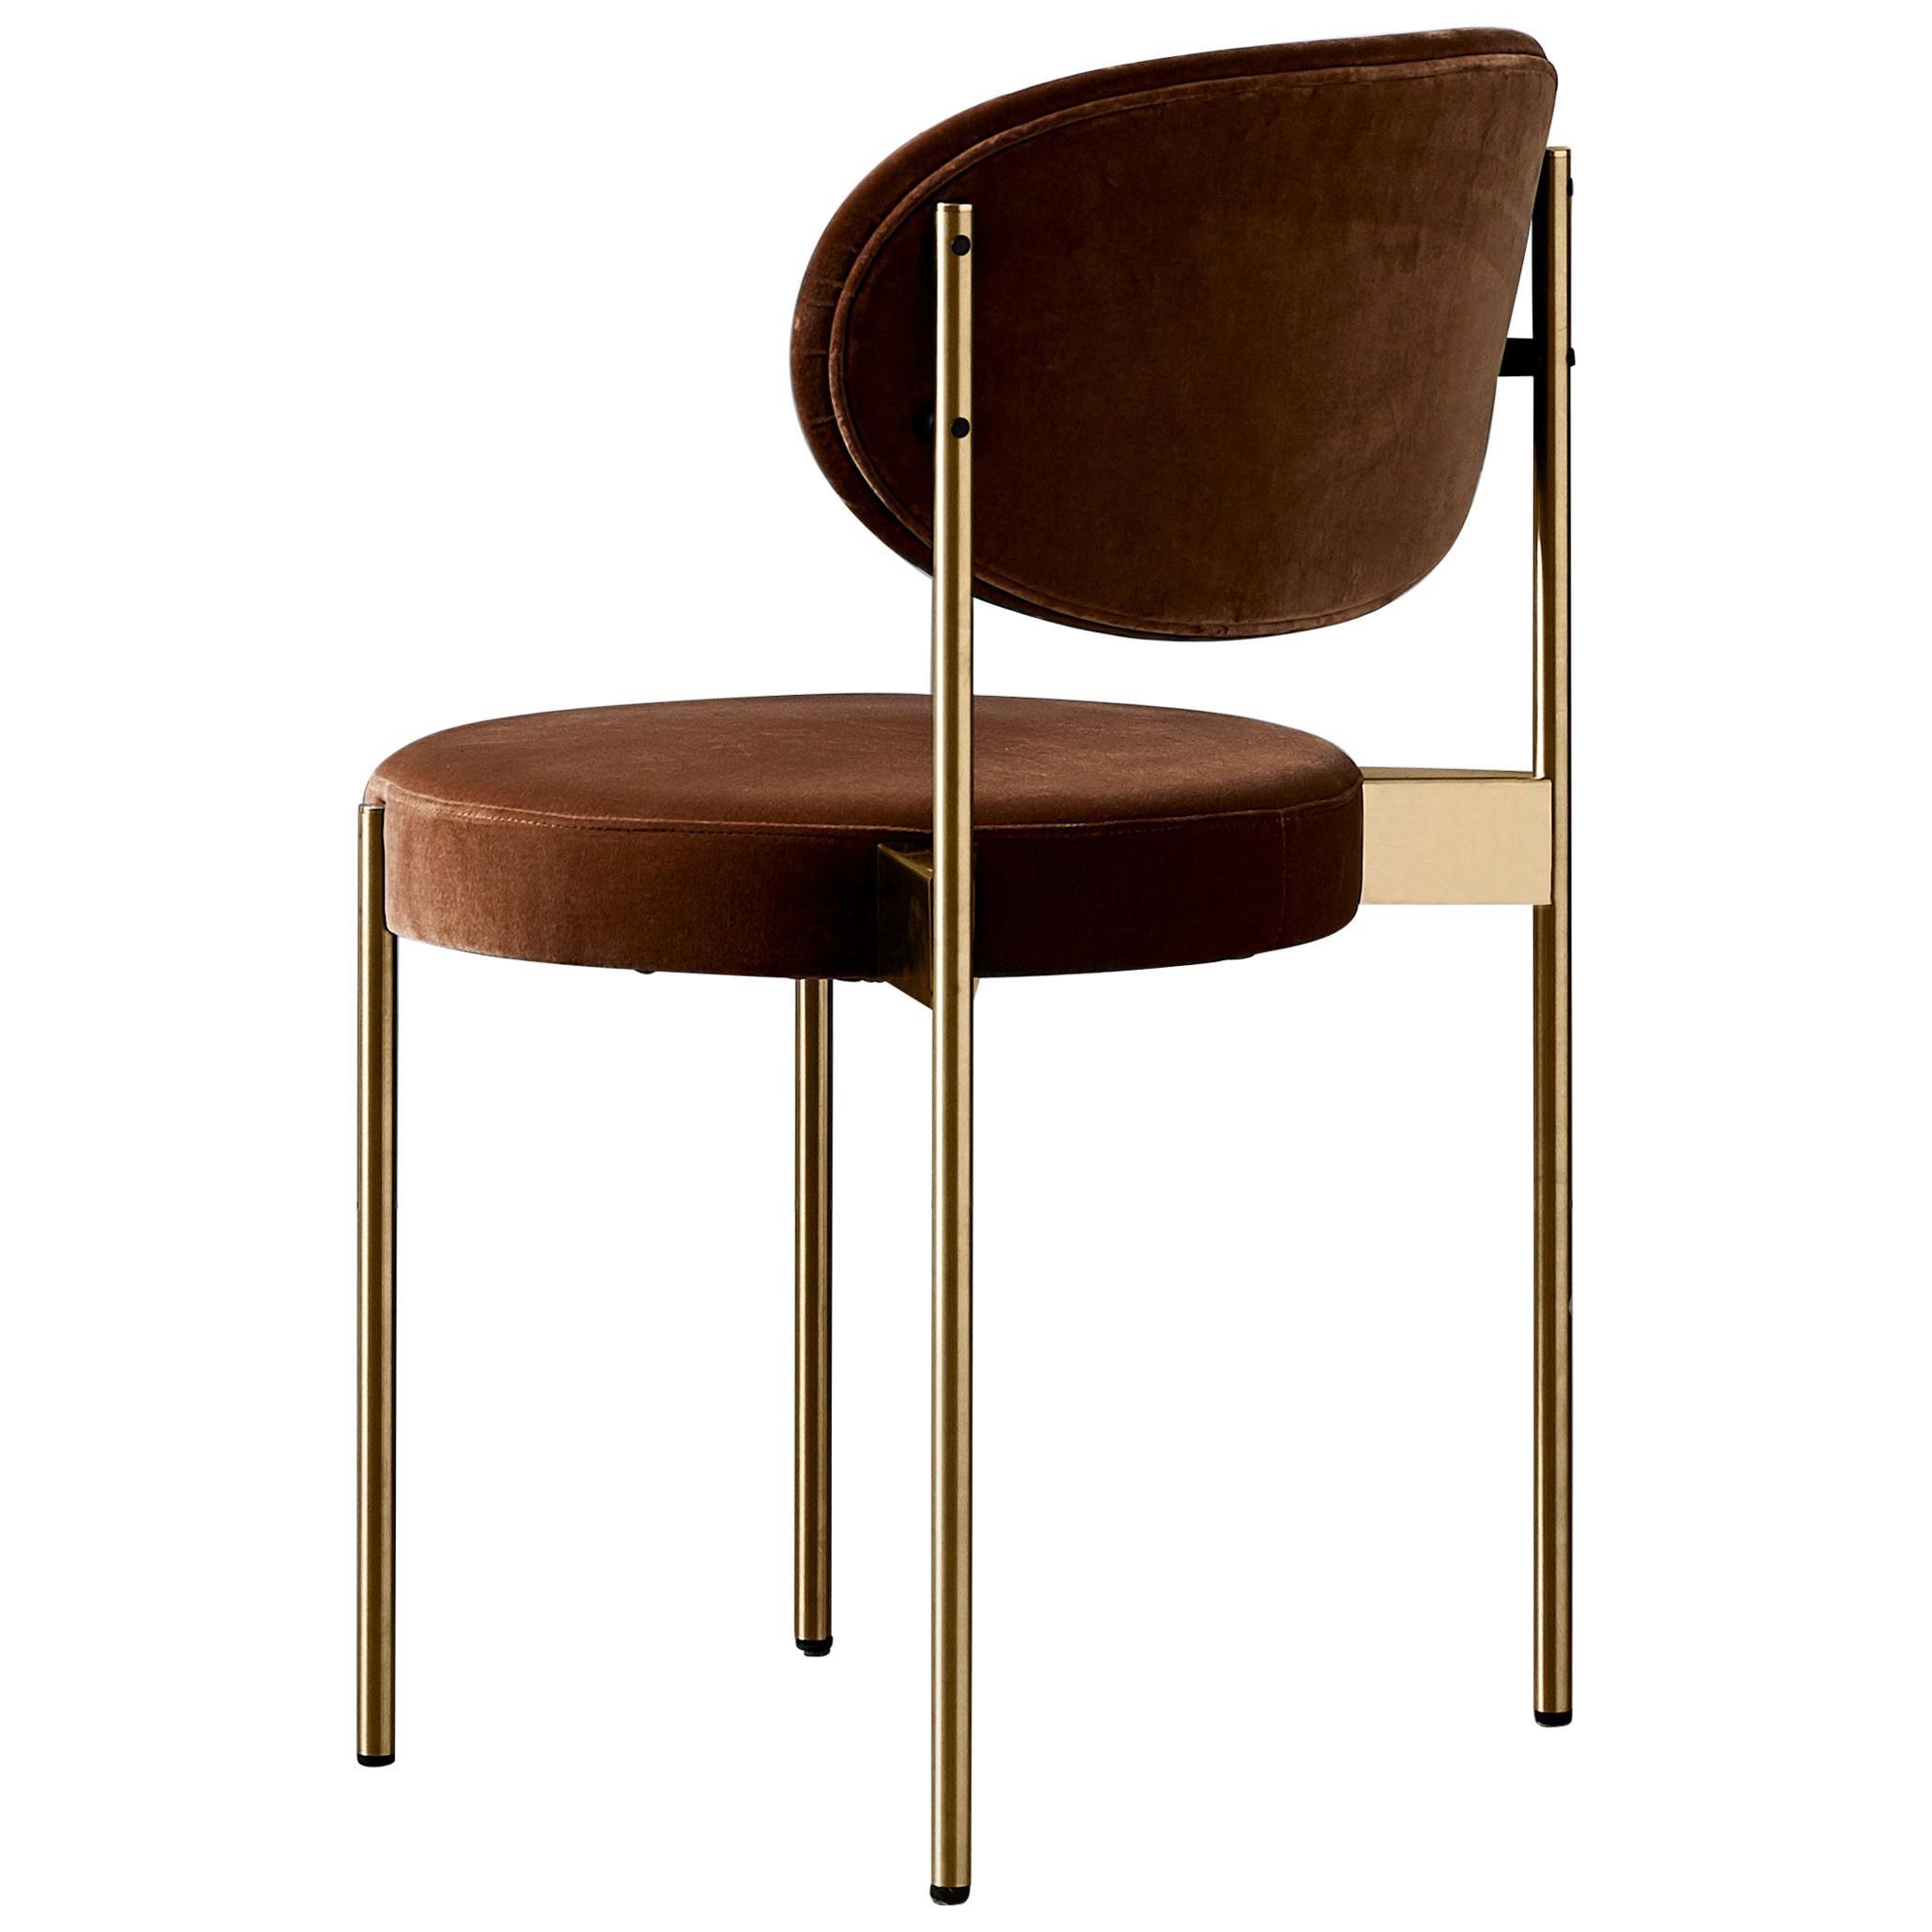 Enjoyable Antique And Vintage Chairs 20 476 For Sale At 1Stdibs Inzonedesignstudio Interior Chair Design Inzonedesignstudiocom